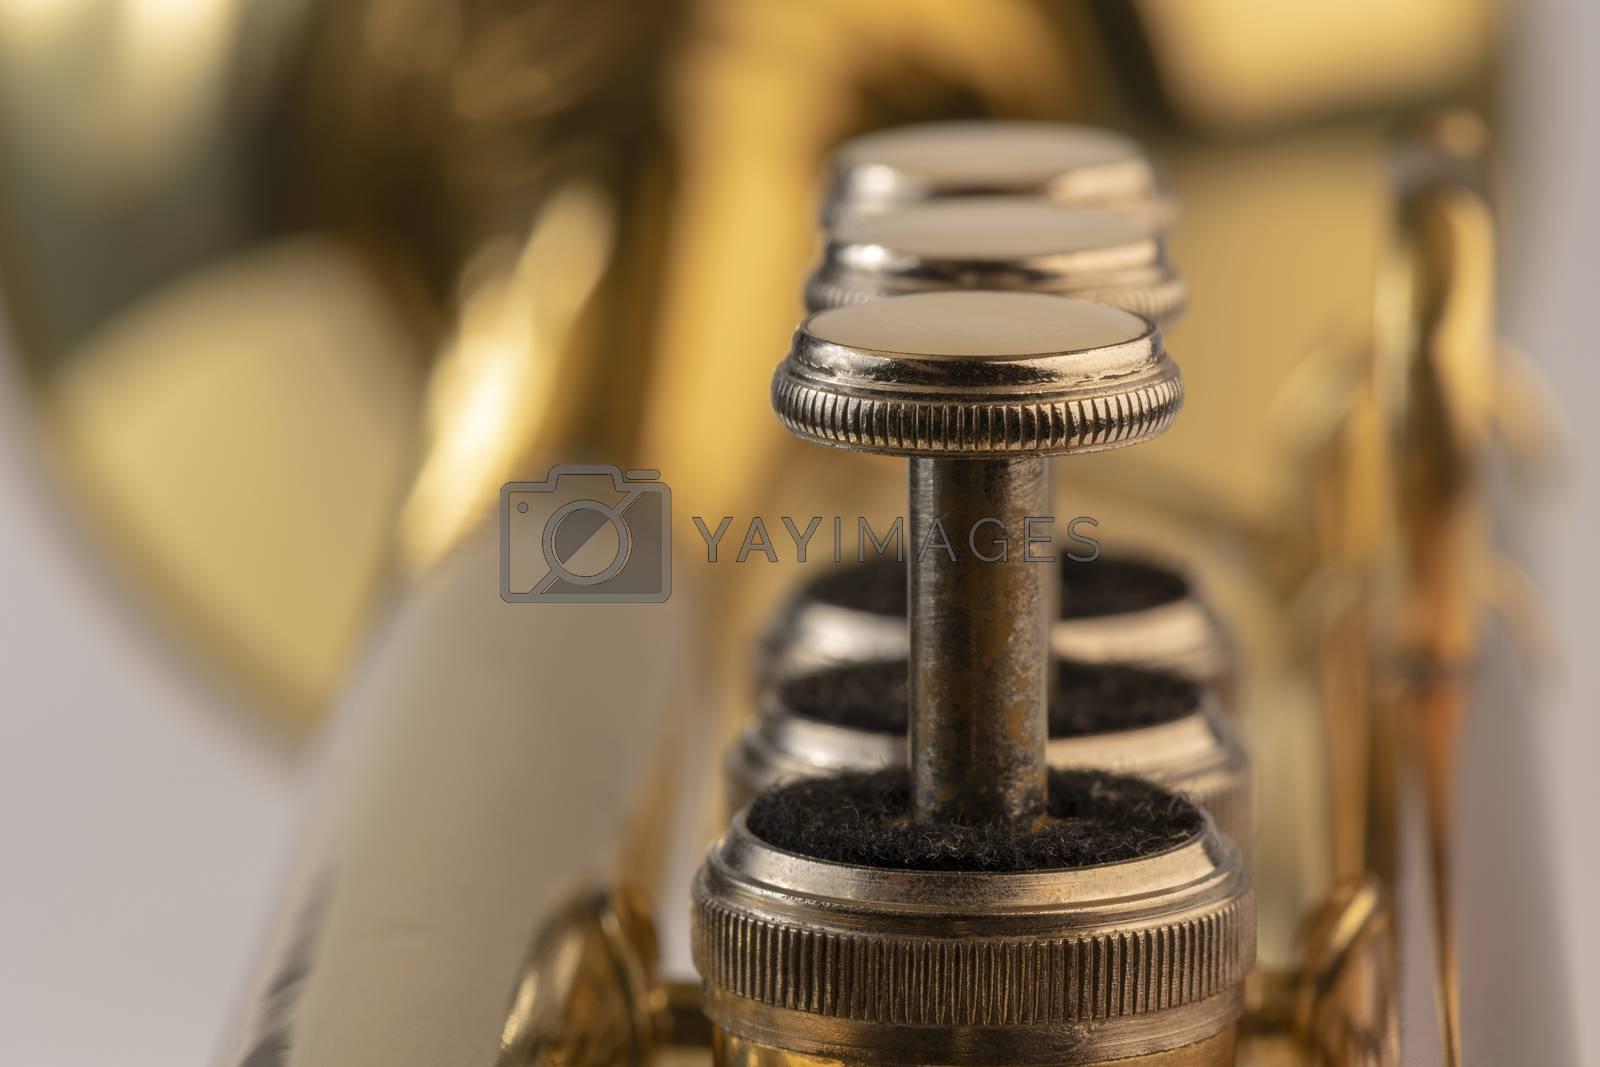 Musical instrument trumpet in detail  by Tofotografie